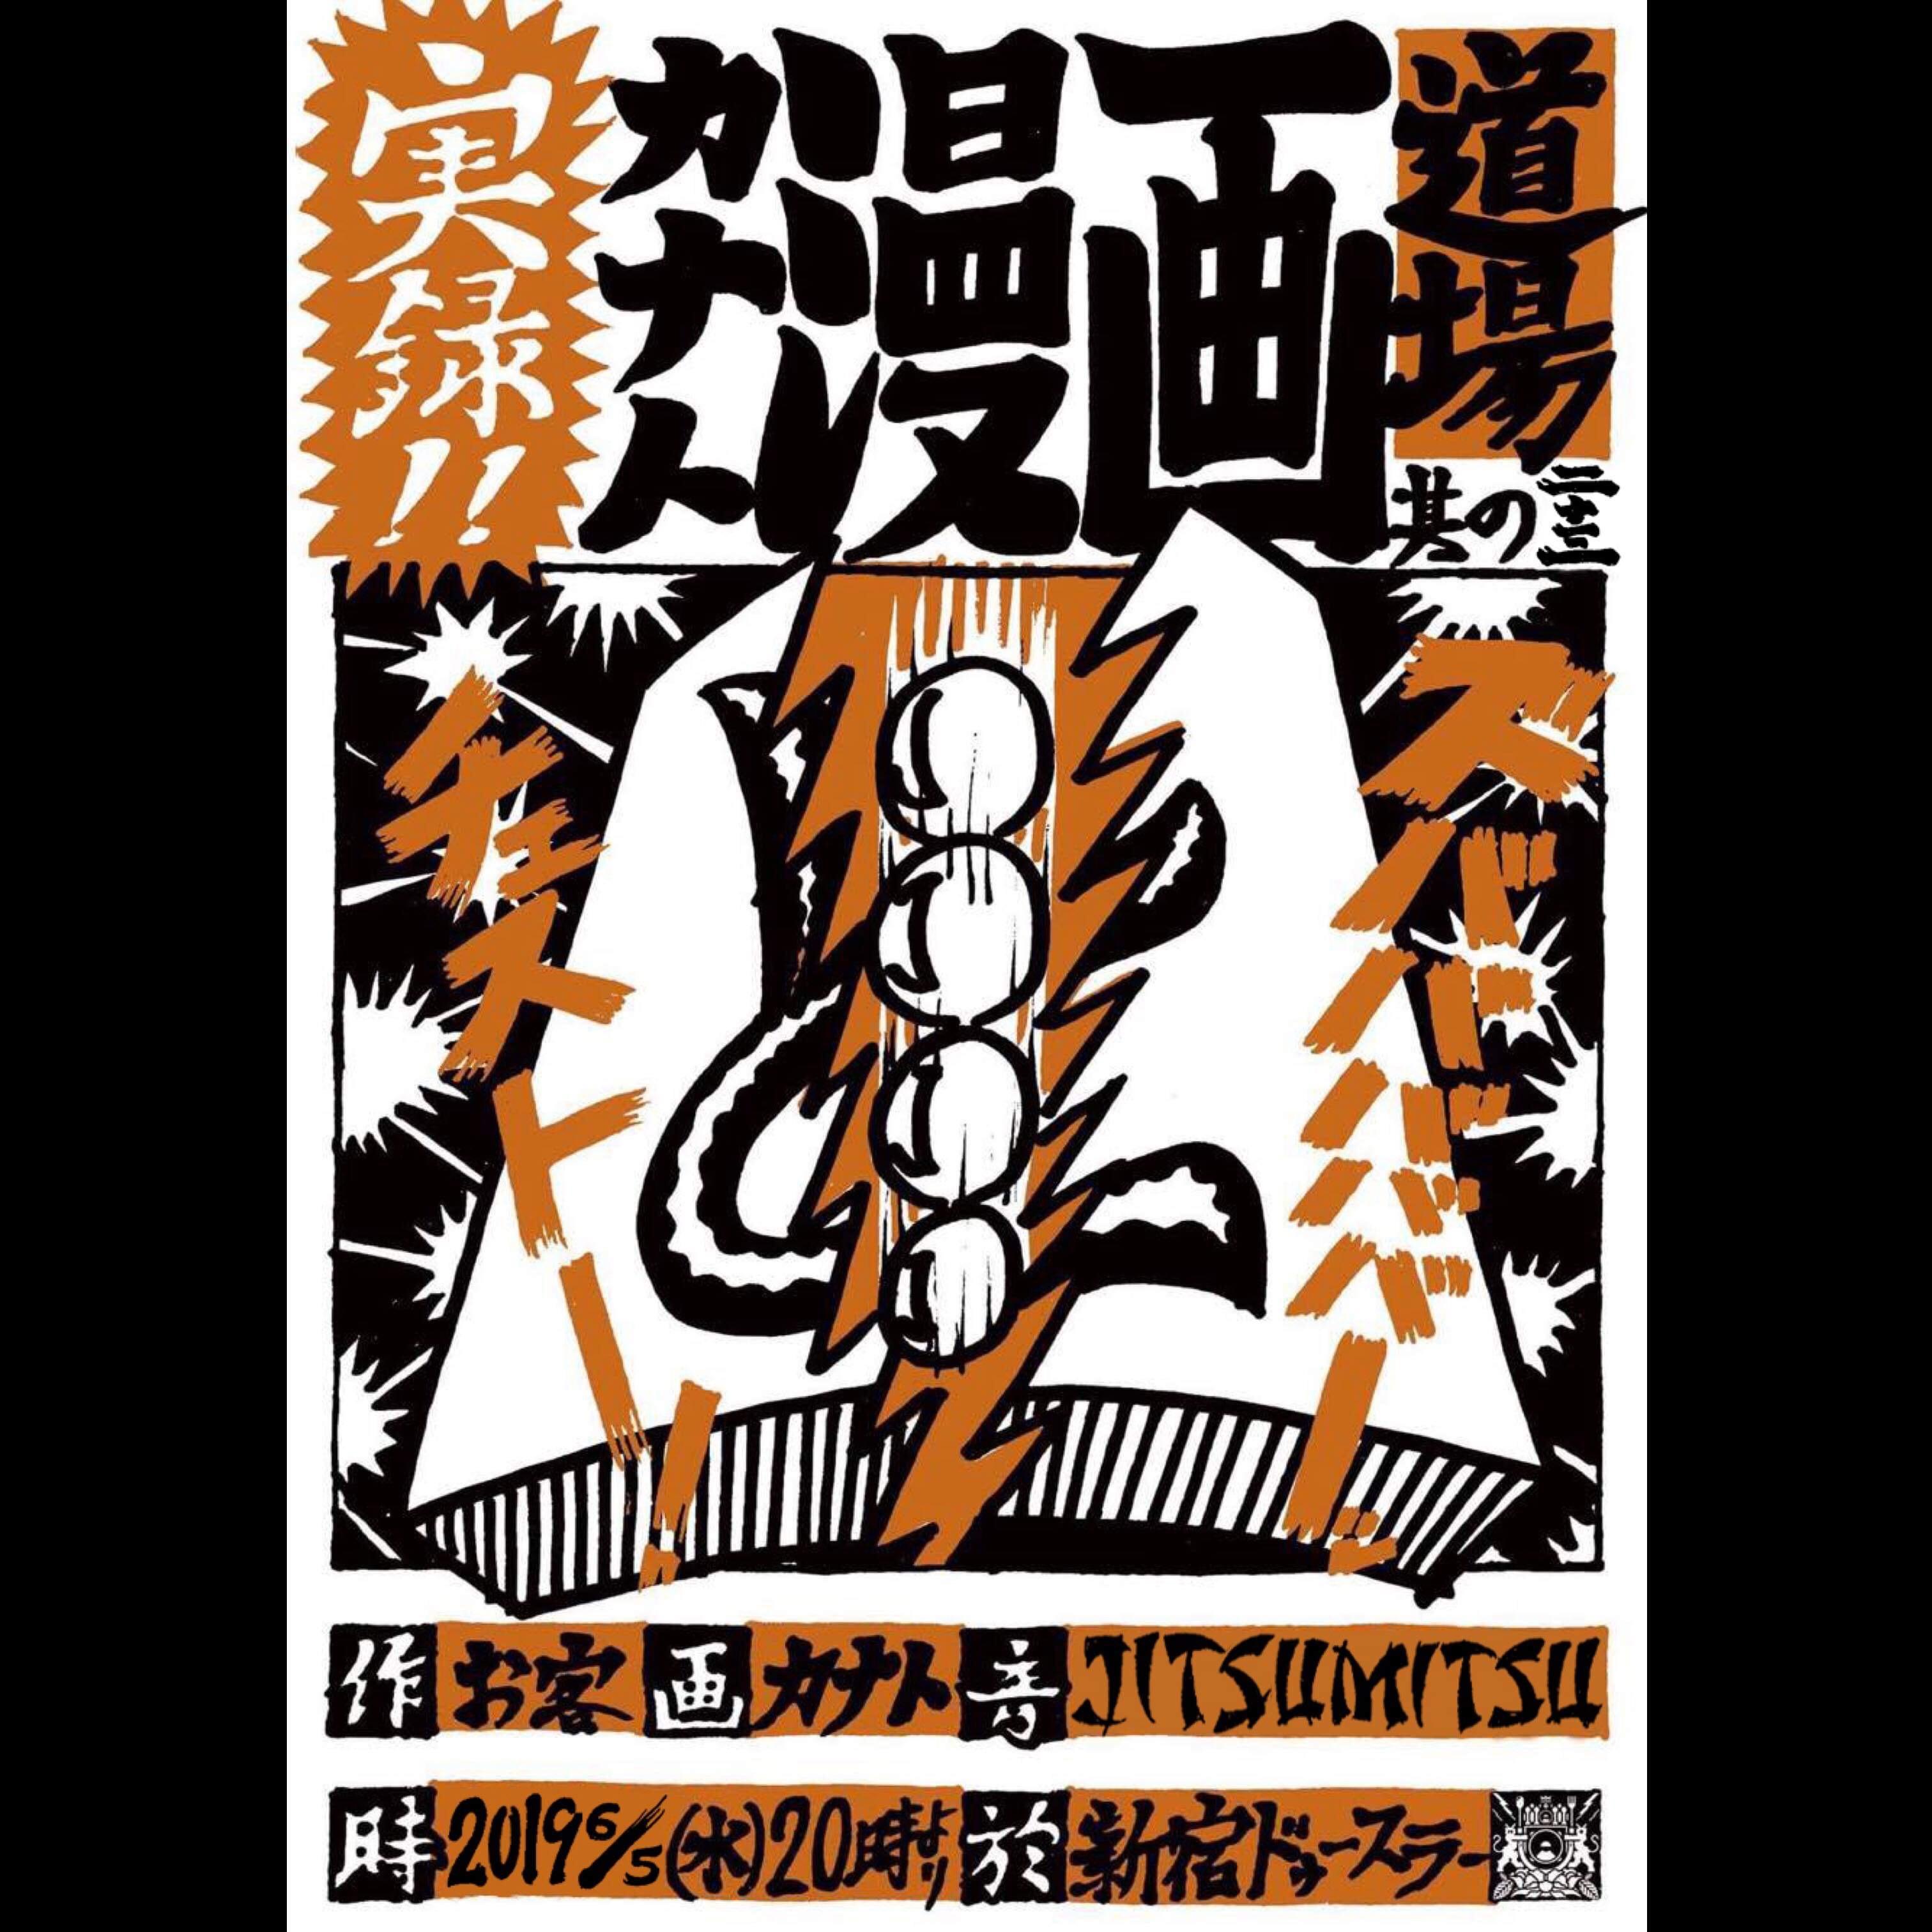 実録‼︎カナト漫画道場